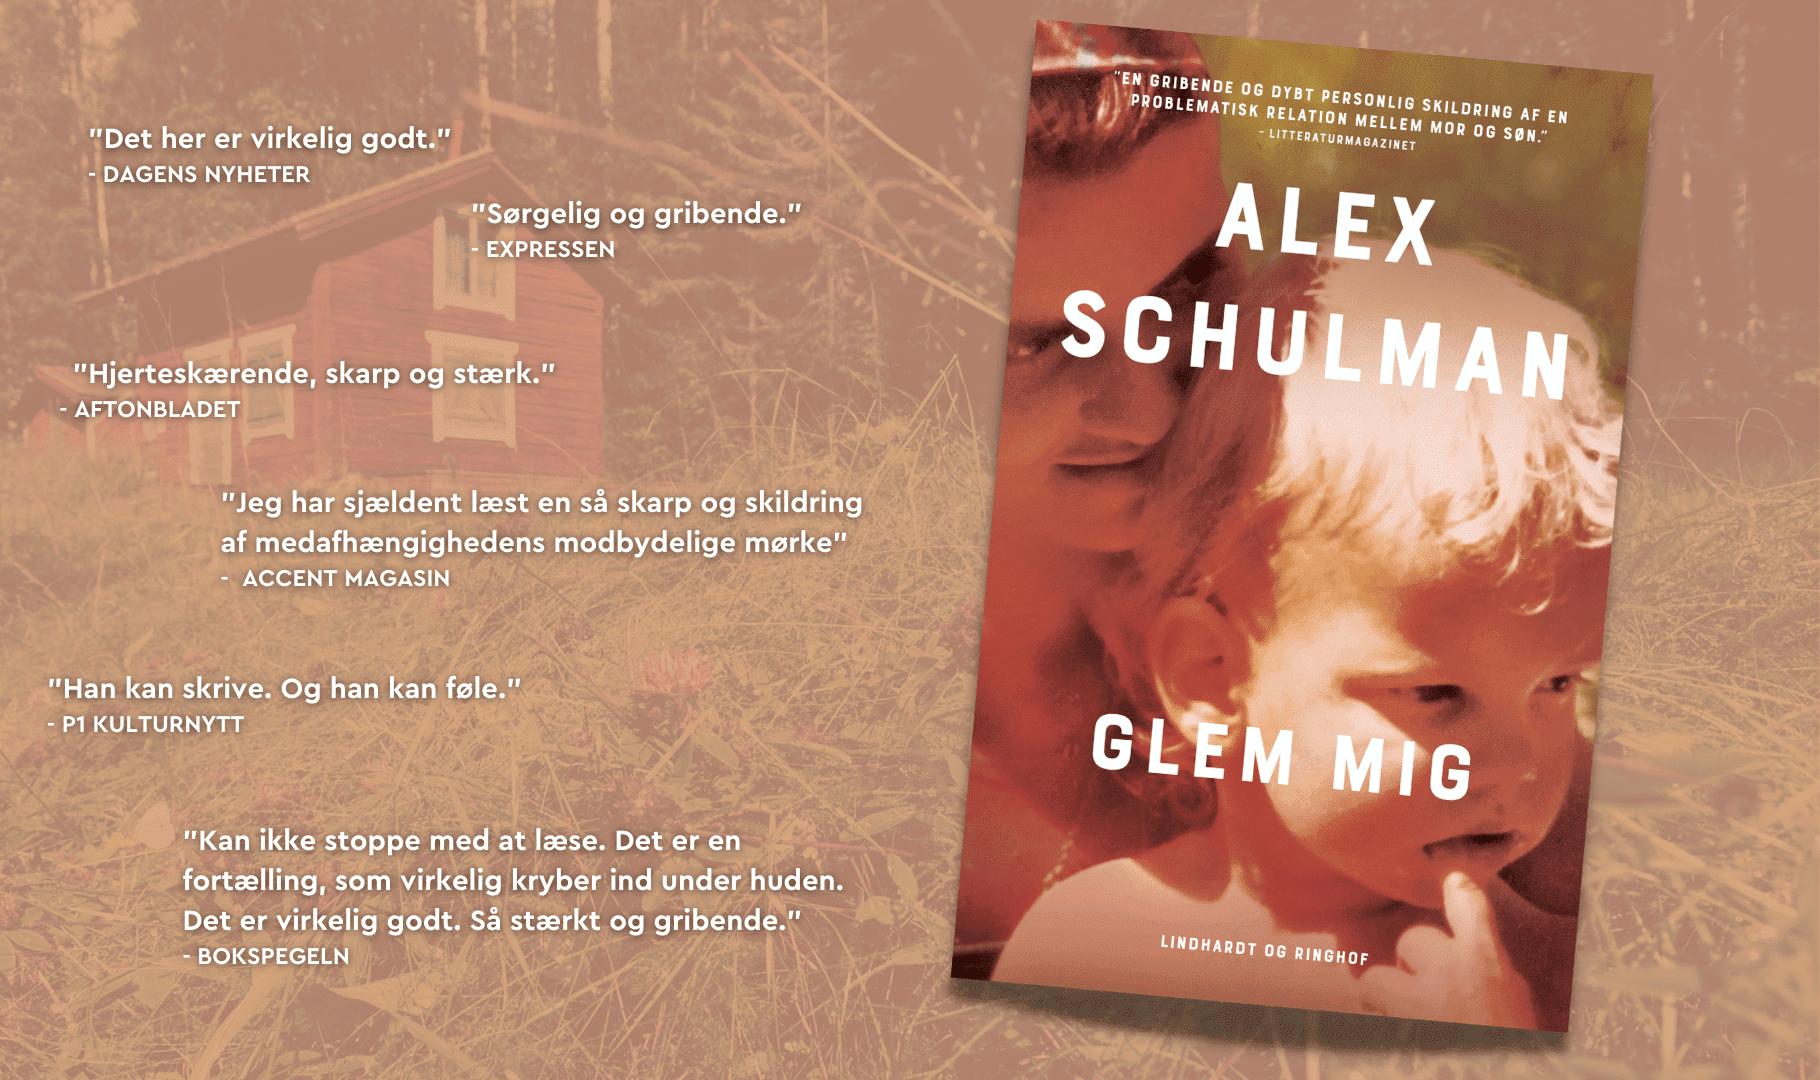 Glem mig af Alex Schulman